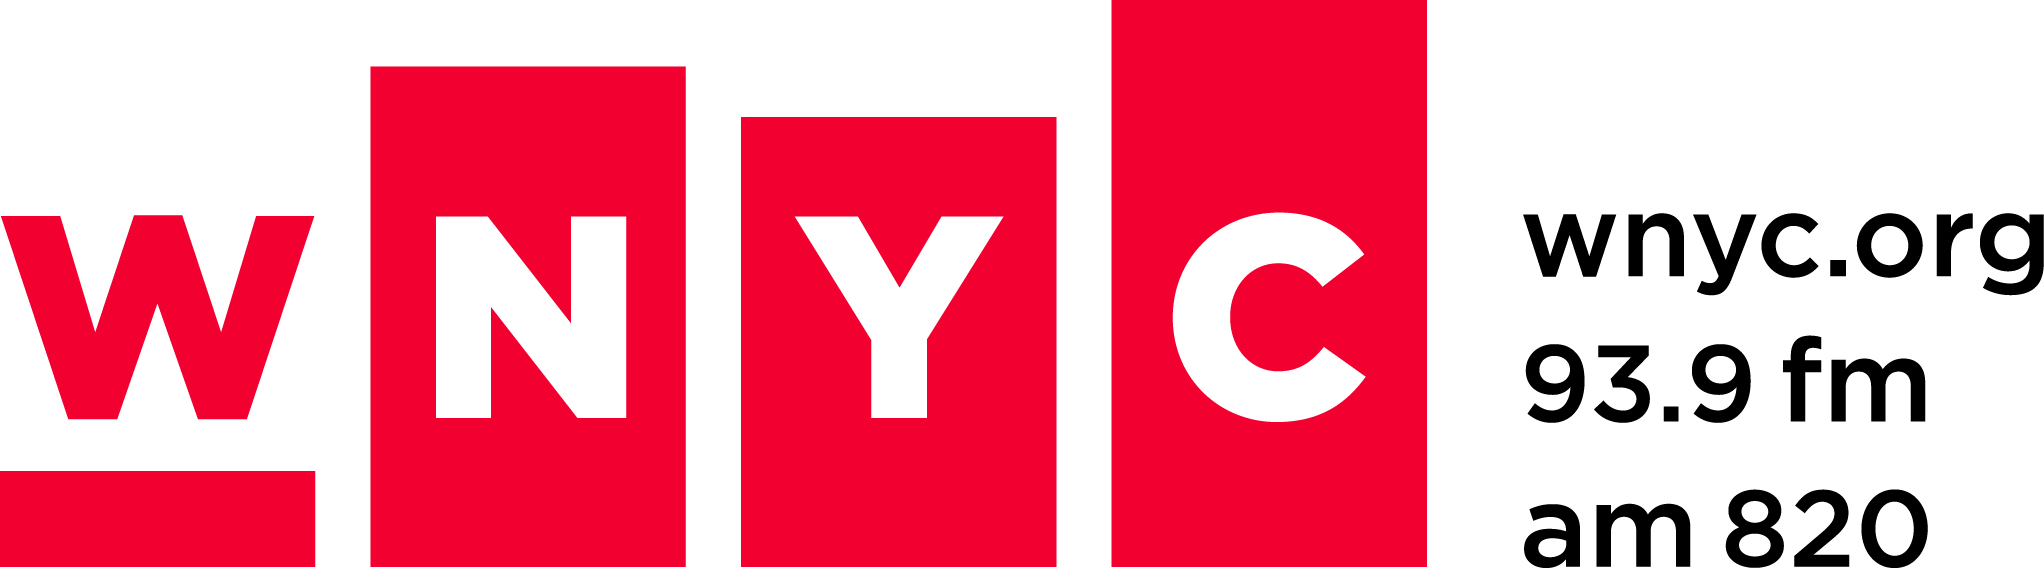 WNYC logo.jpg